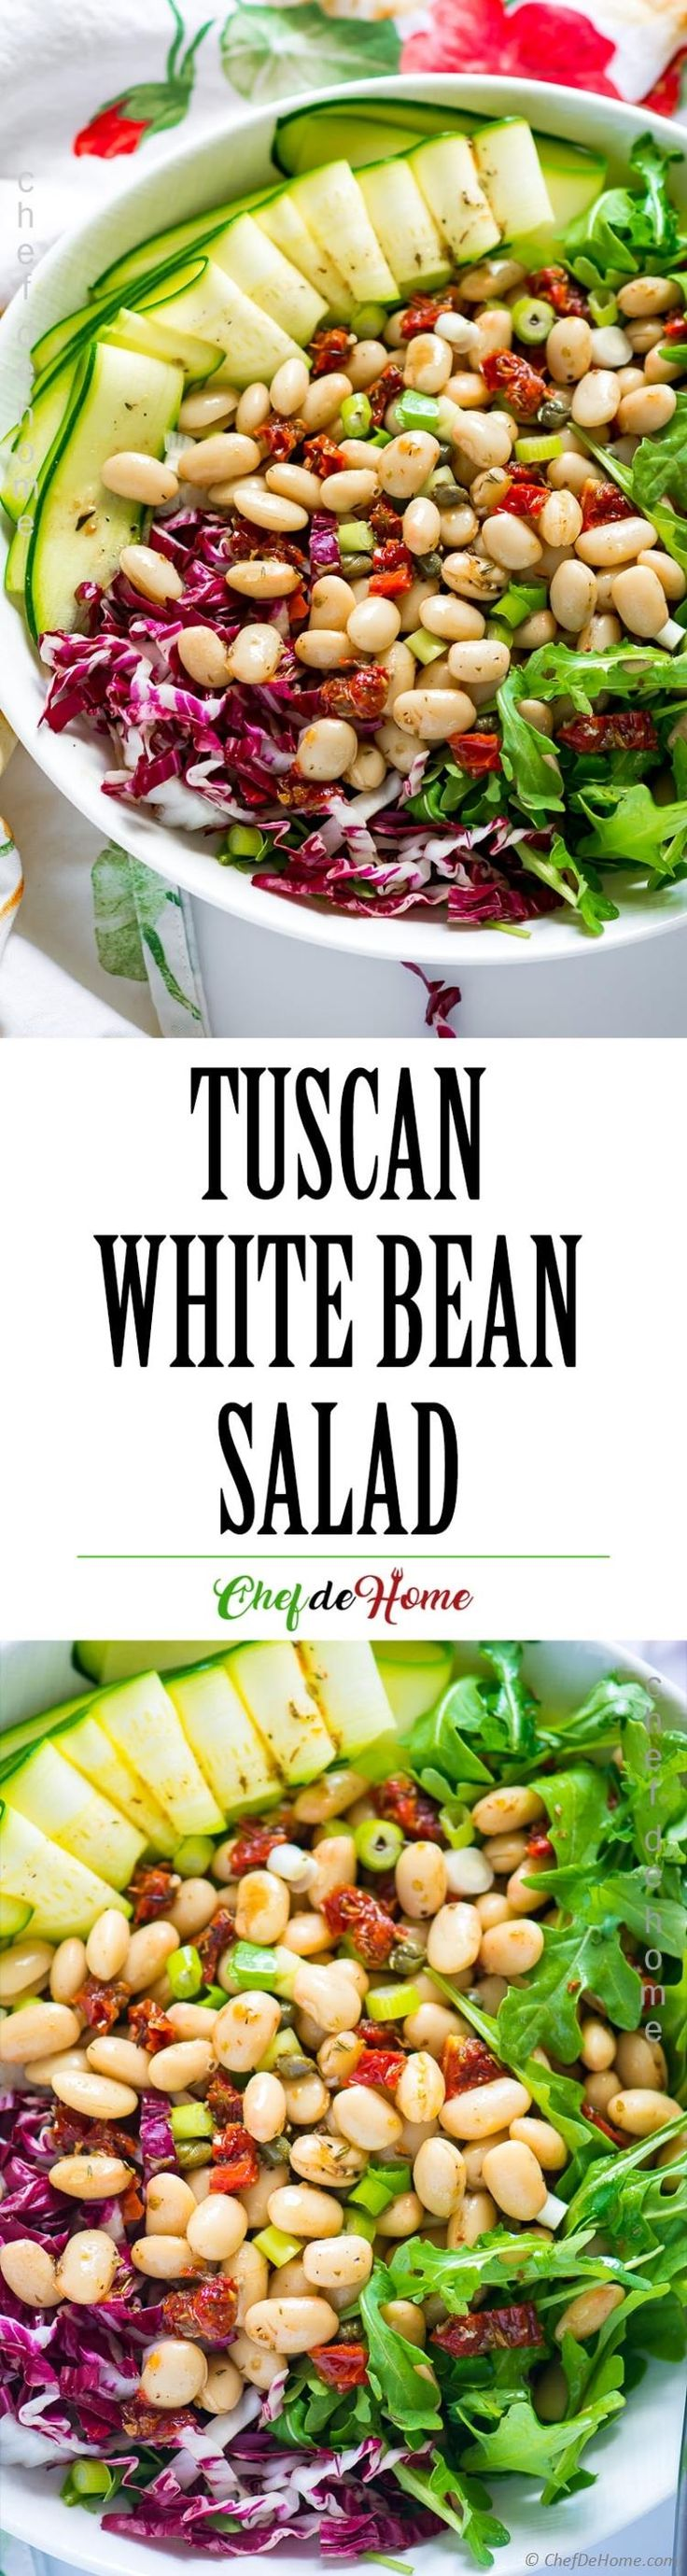 Easy and Healthy Tuscan Bean Salad with Arugula #glutenfree #salad #sundried #tomatoes #veganrecipes #plantbased #plantbaseddiet #zucchini #arugula